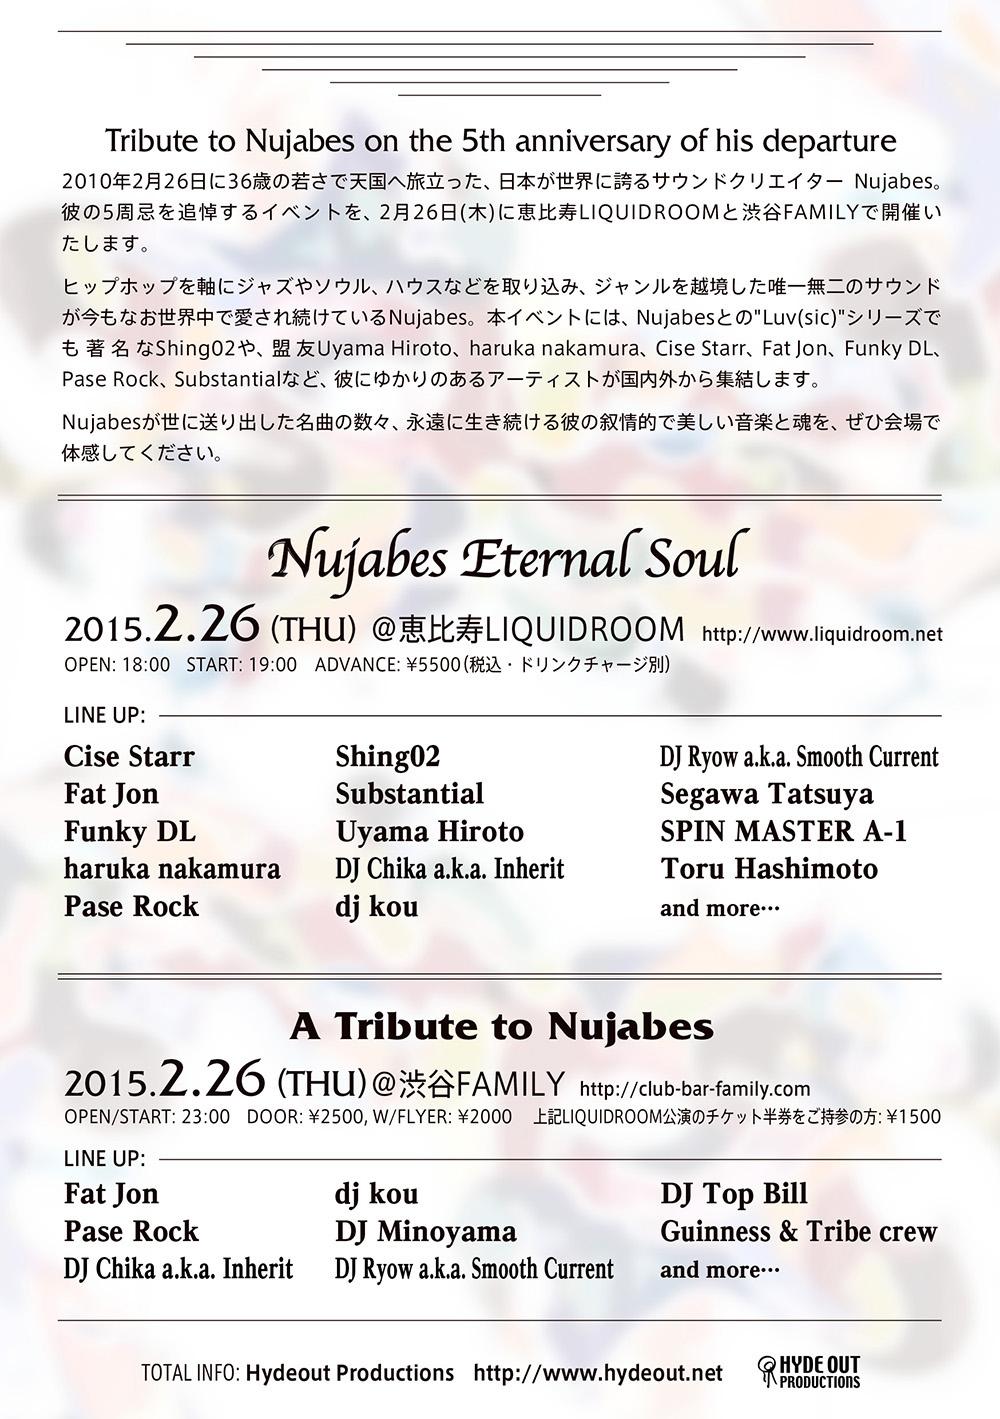 Nujabes Eternal Soul 出演者追加